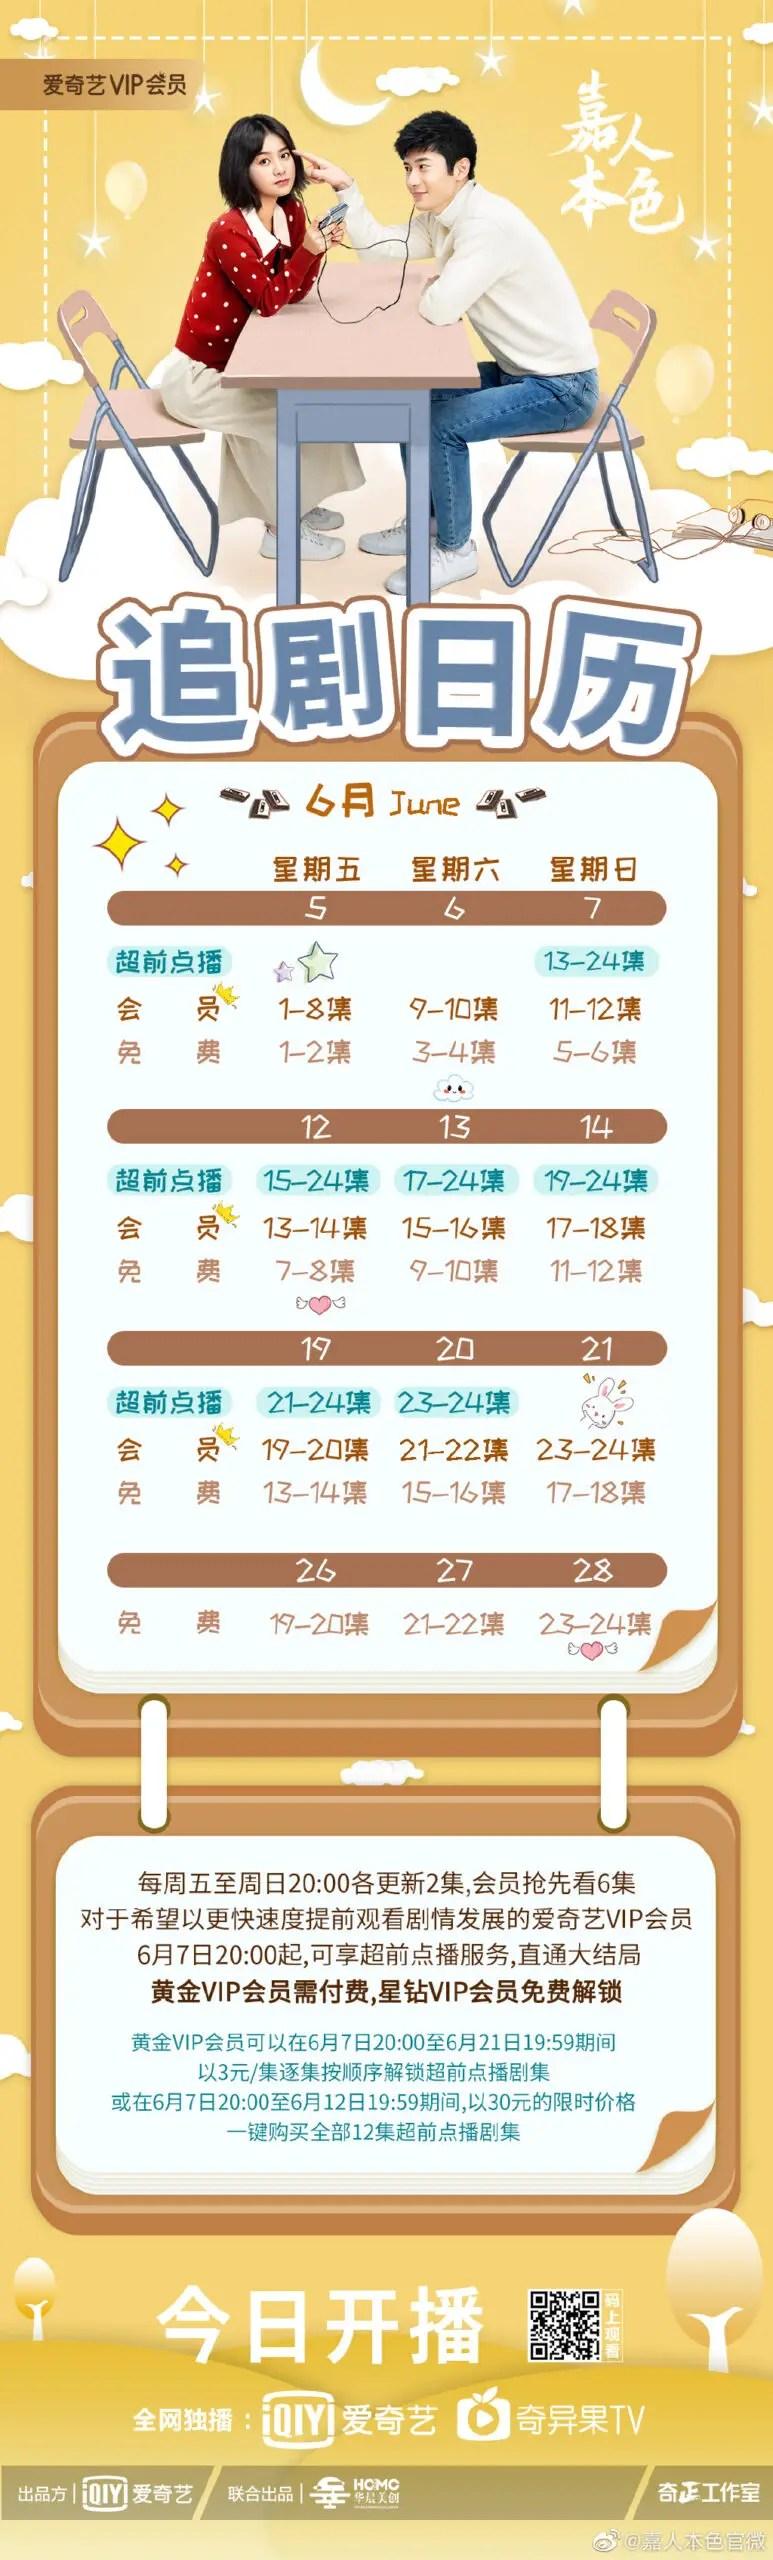 True Colours Drama Airing Calendar